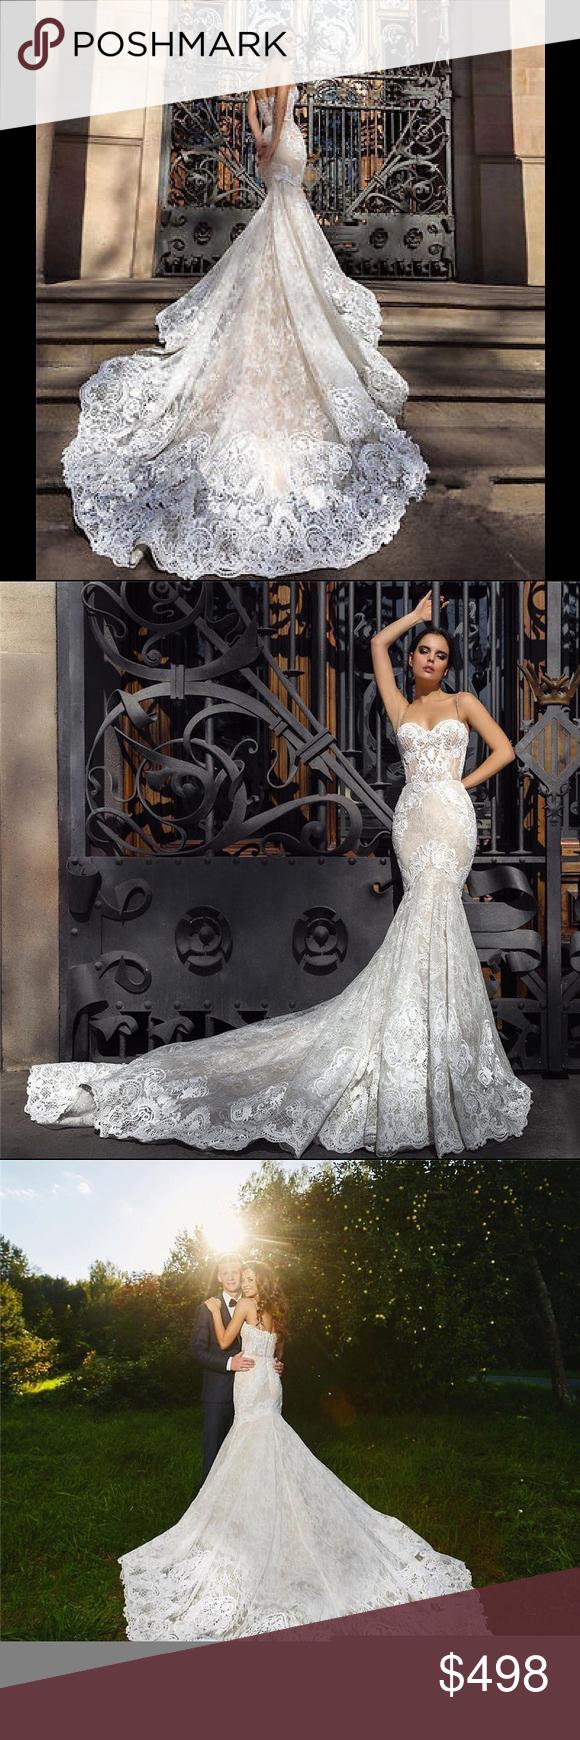 Custom made wedding dress  PRE ORDER CUSTOM TUSCANY STYLE WEDDING DRESS  SALE SALE